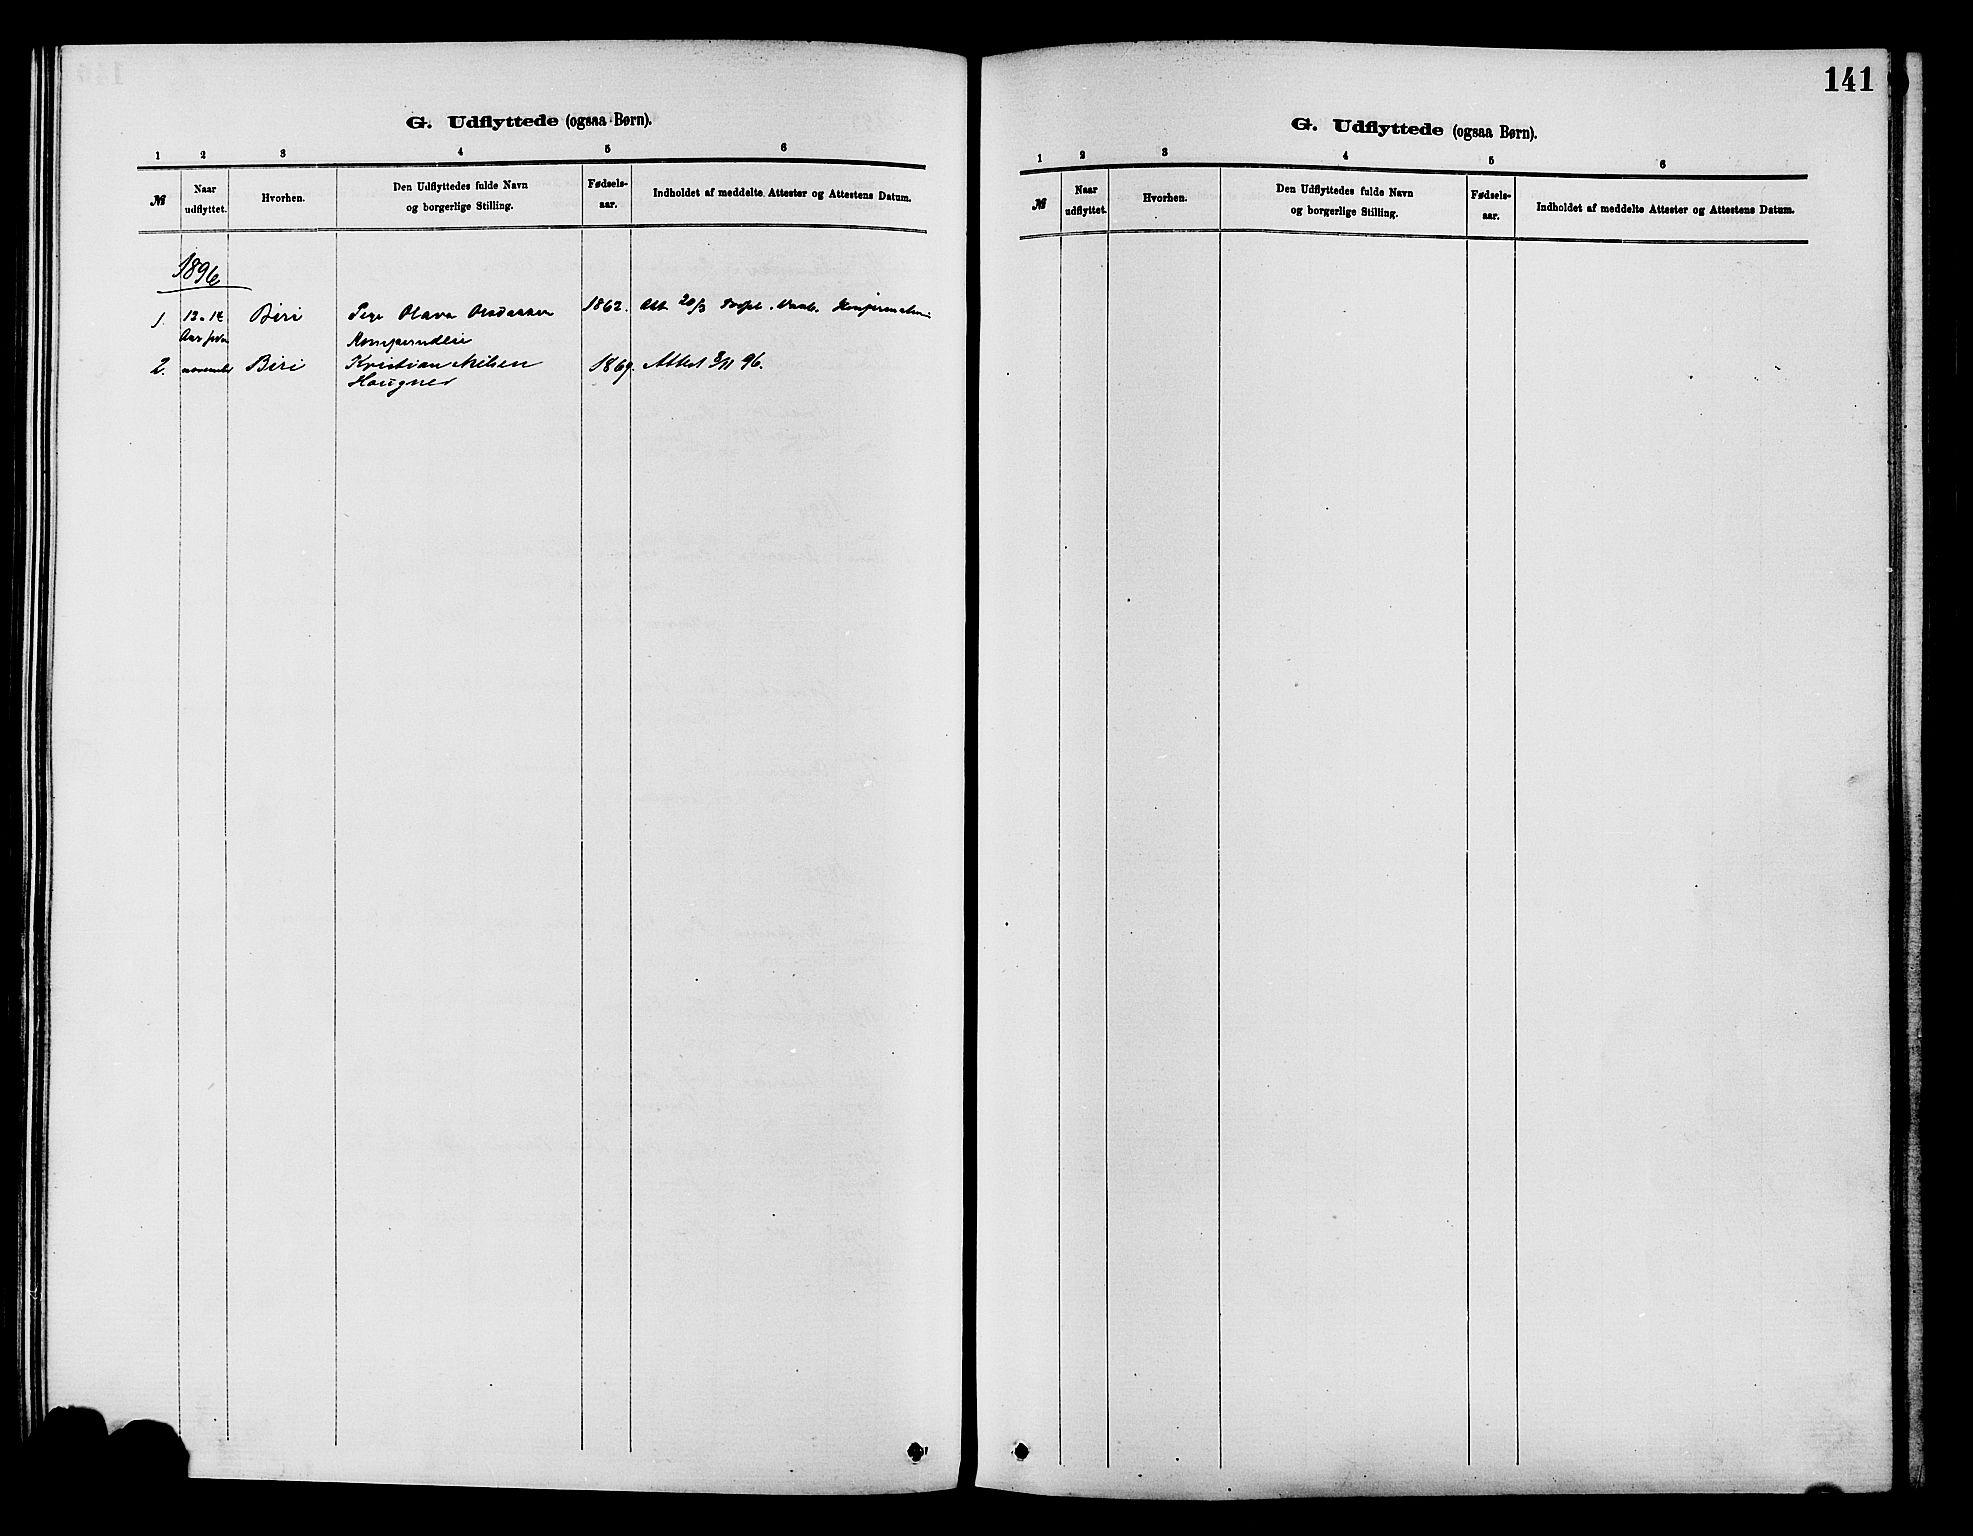 SAH, Nordre Land prestekontor, Ministerialbok nr. 3, 1882-1896, s. 141